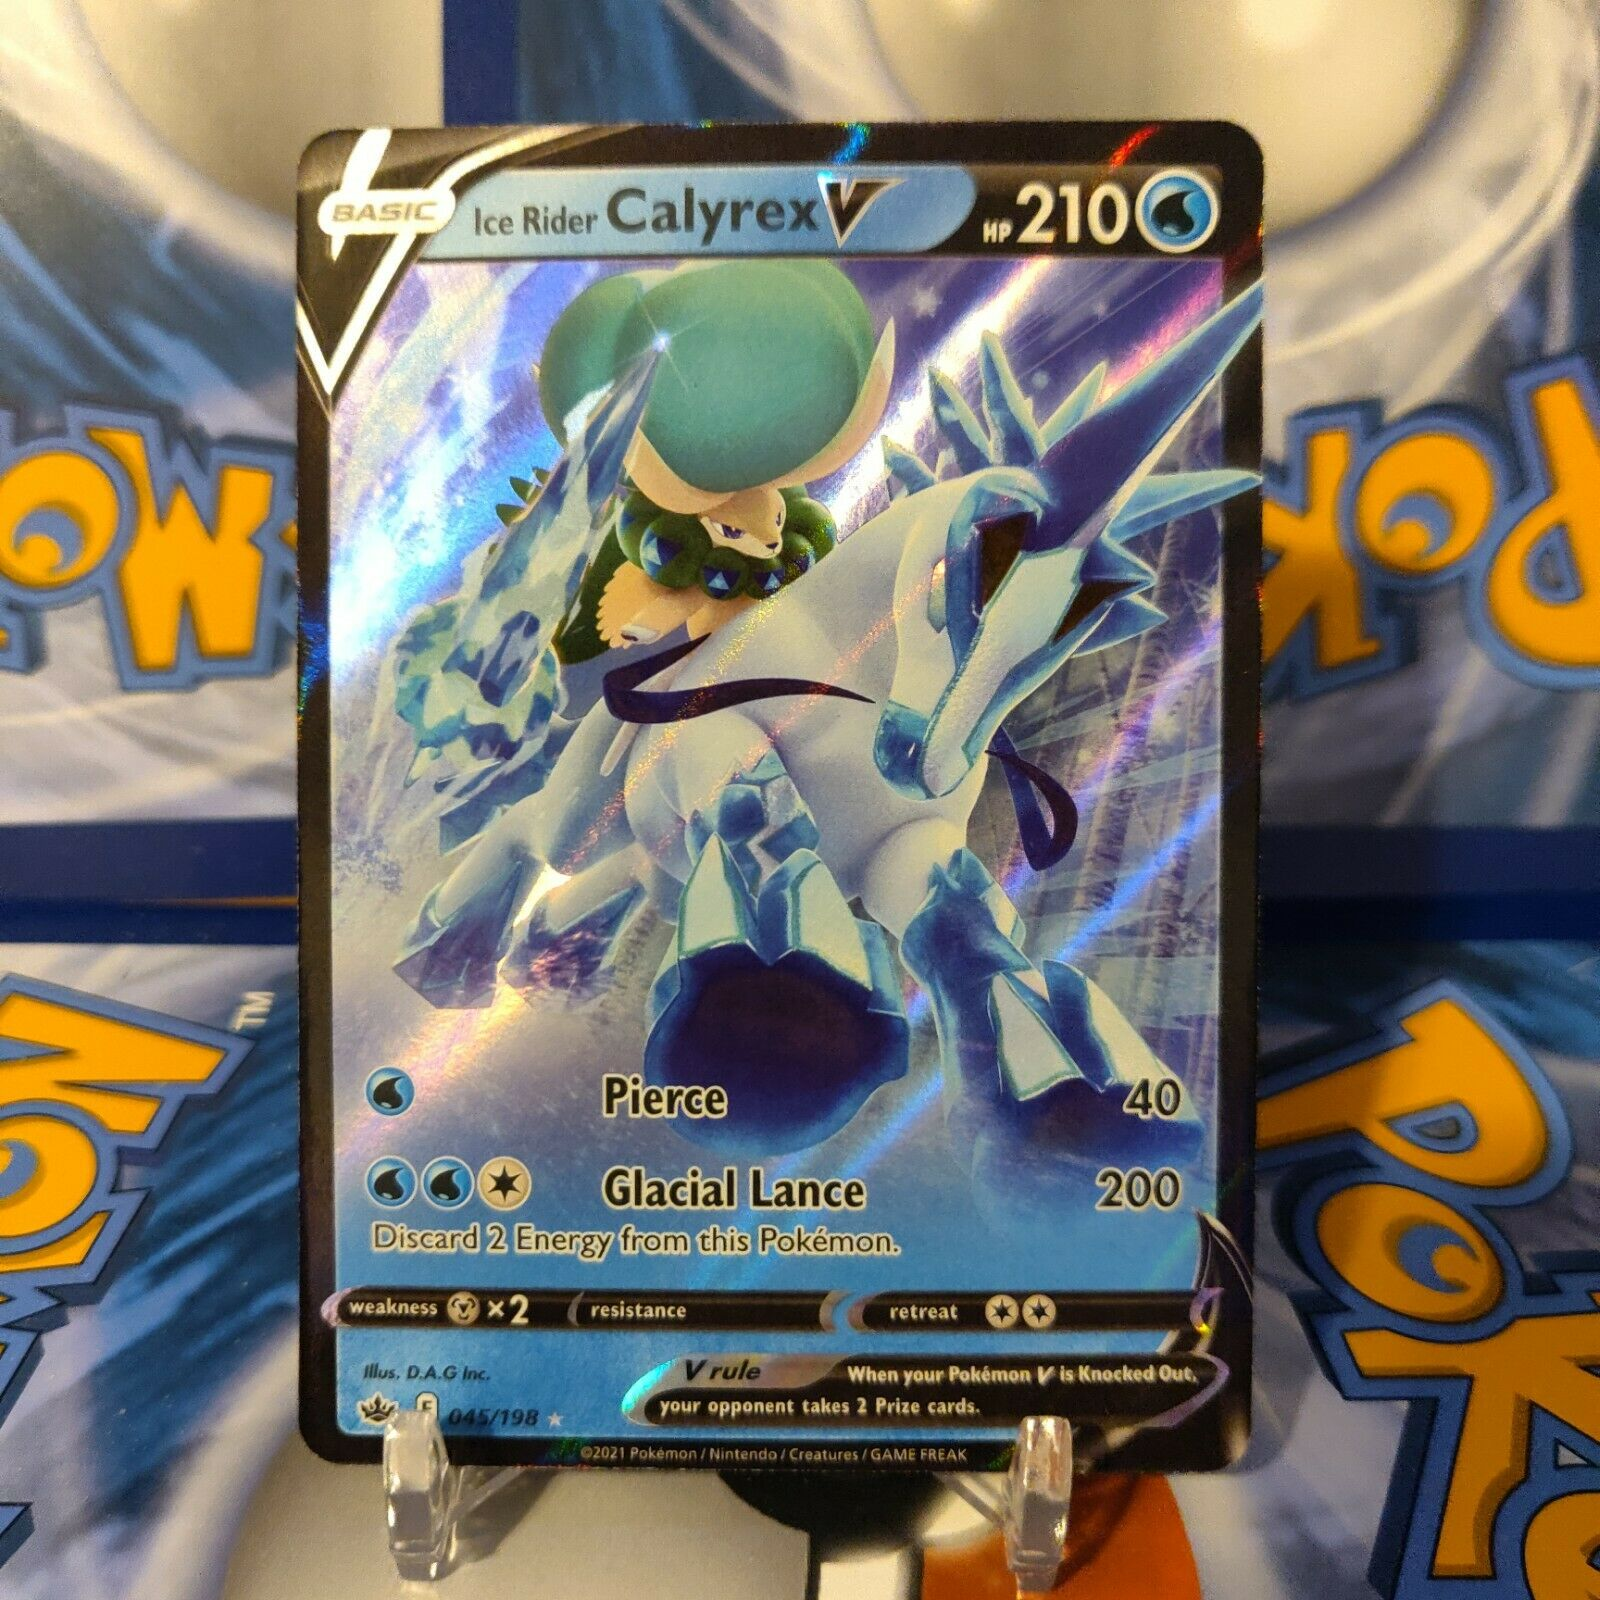 Pokemon TCG Chilling Reign ICE RIDER CALYREX V Holo Rare Card # 045/198